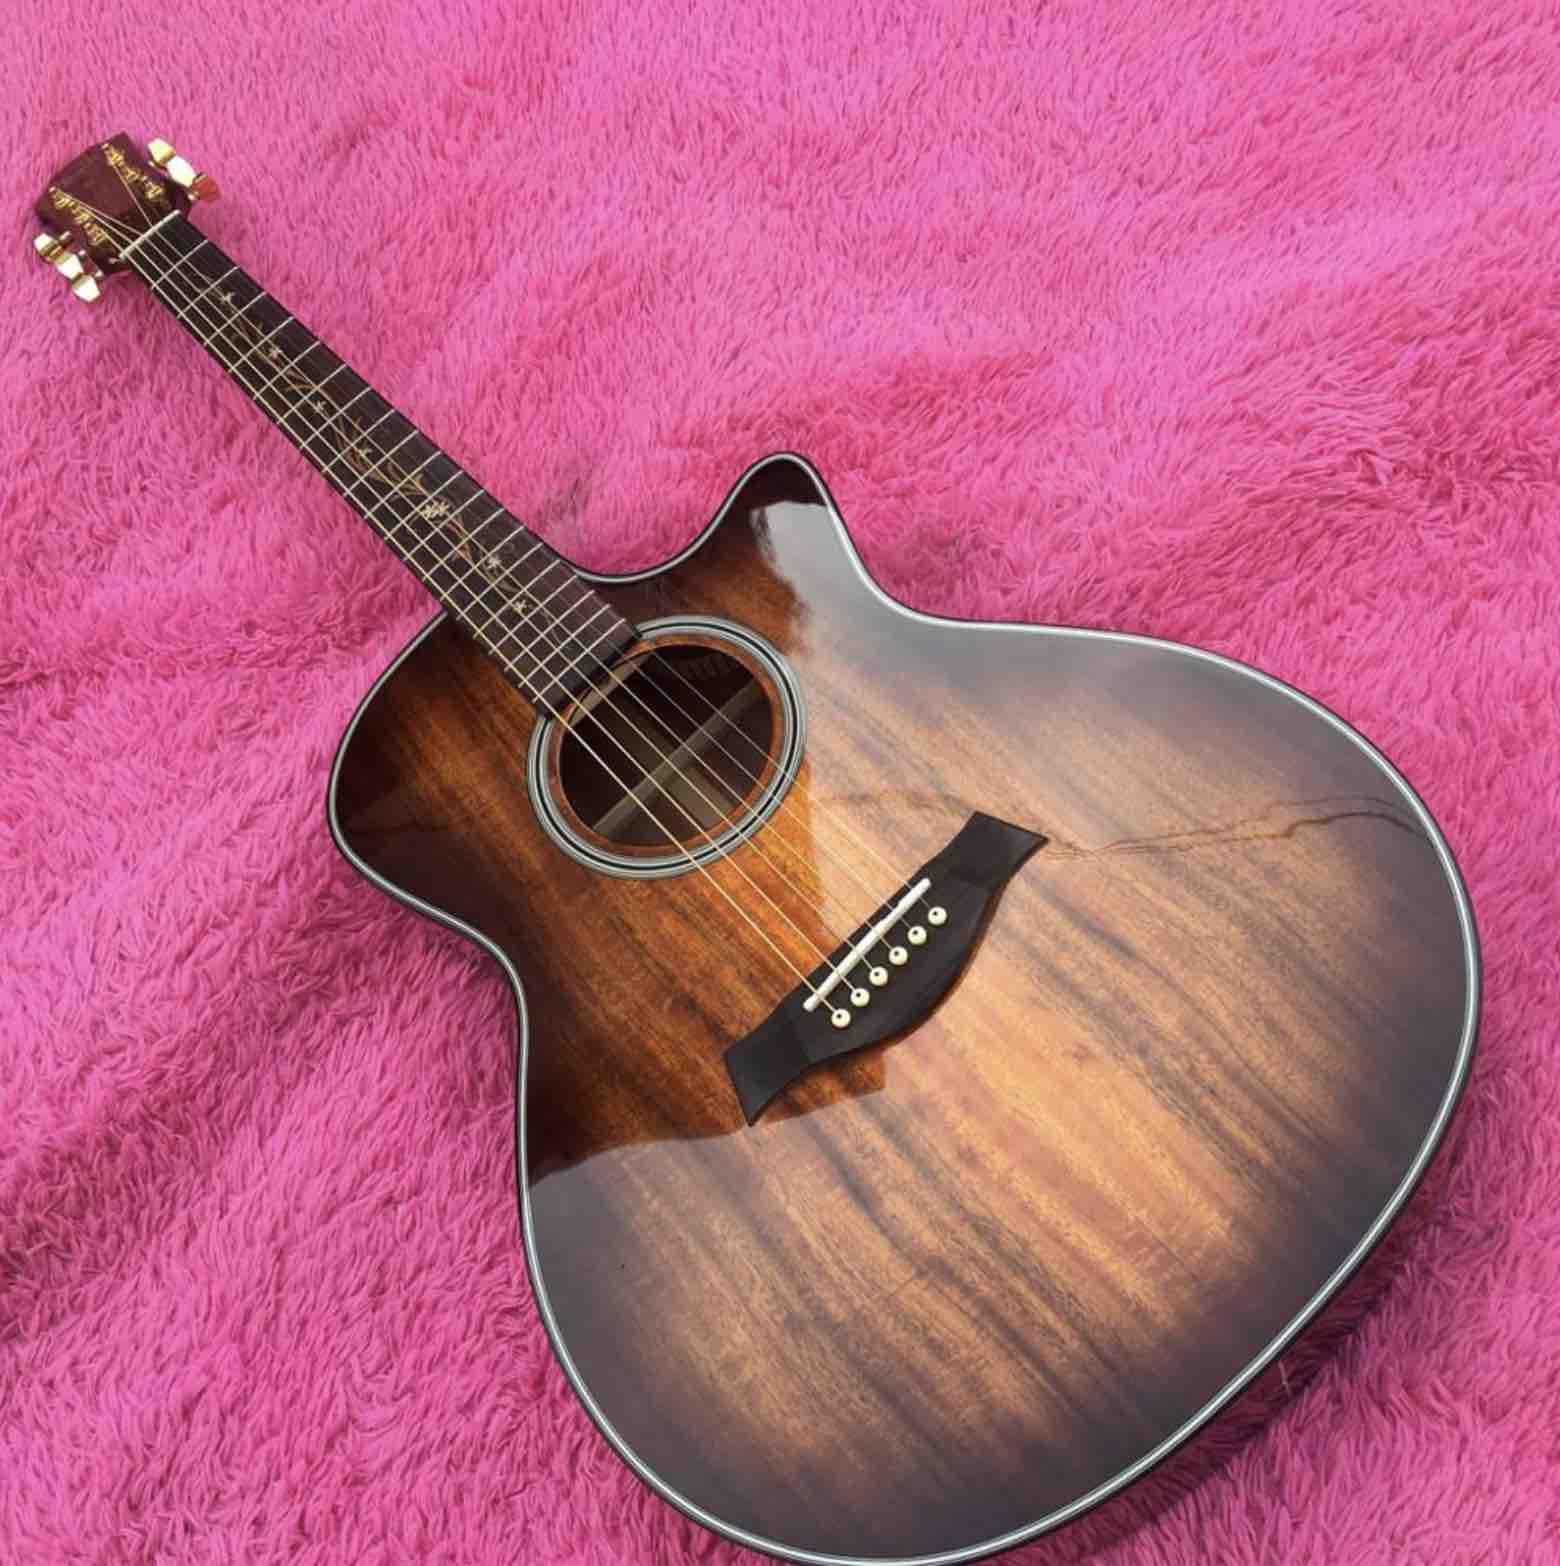 New Cutaway 41 Inch Gk24ce Rosewood Fingerboard Solid Koa Acoustic Electric Guitar